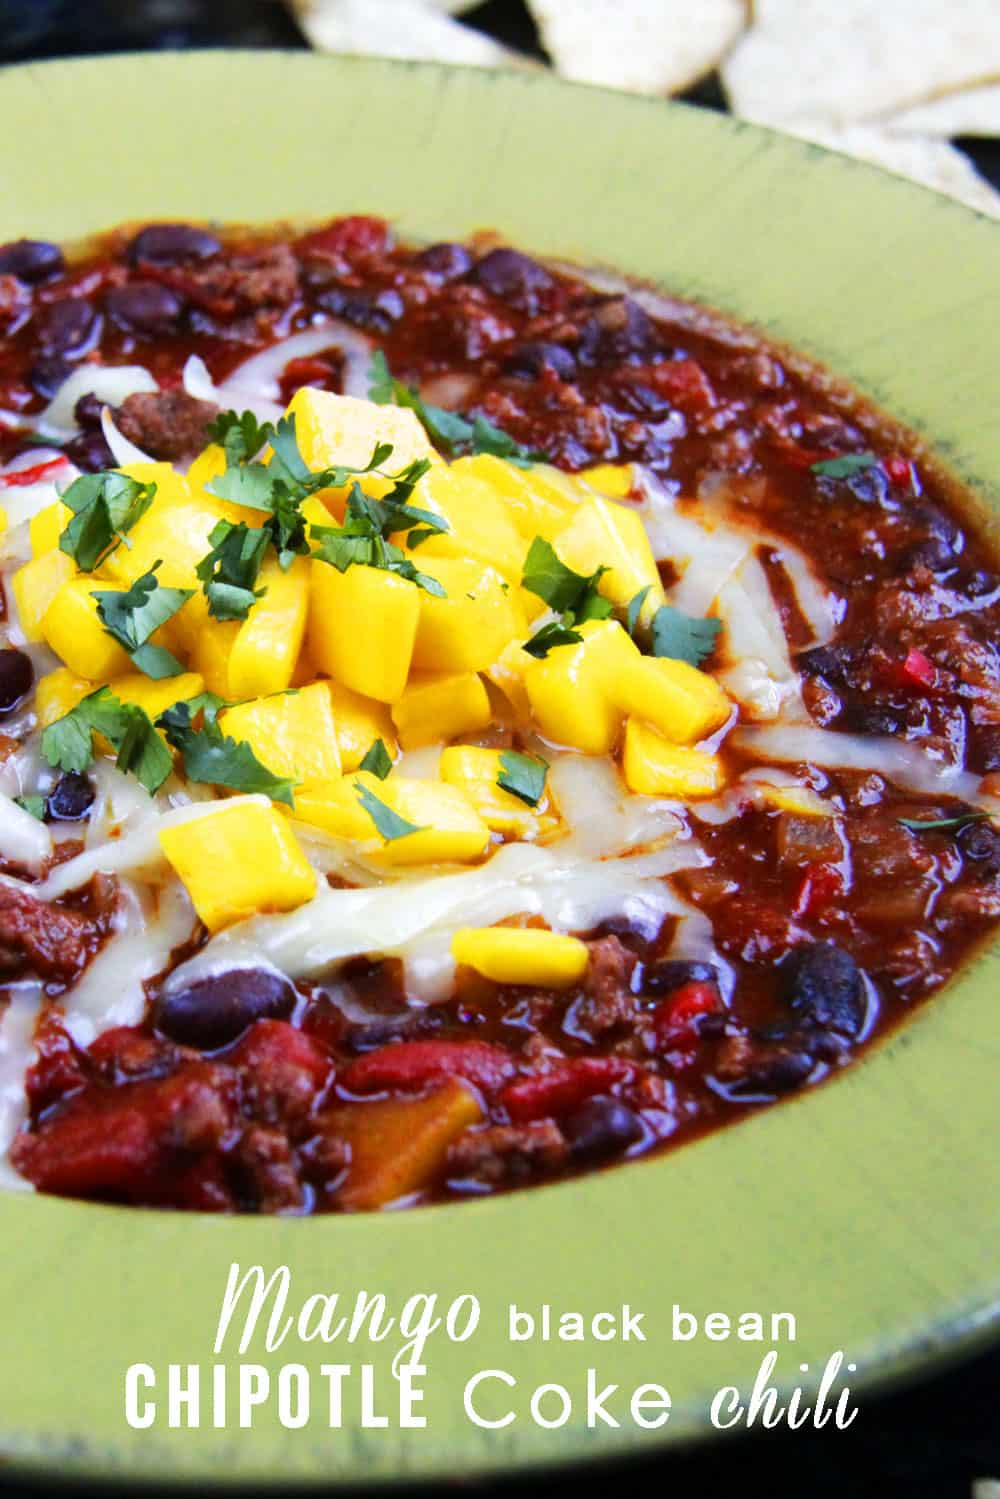 Chipotle Chicken, Mango and Black Bean Enchiladas - Carlsbad Cravings